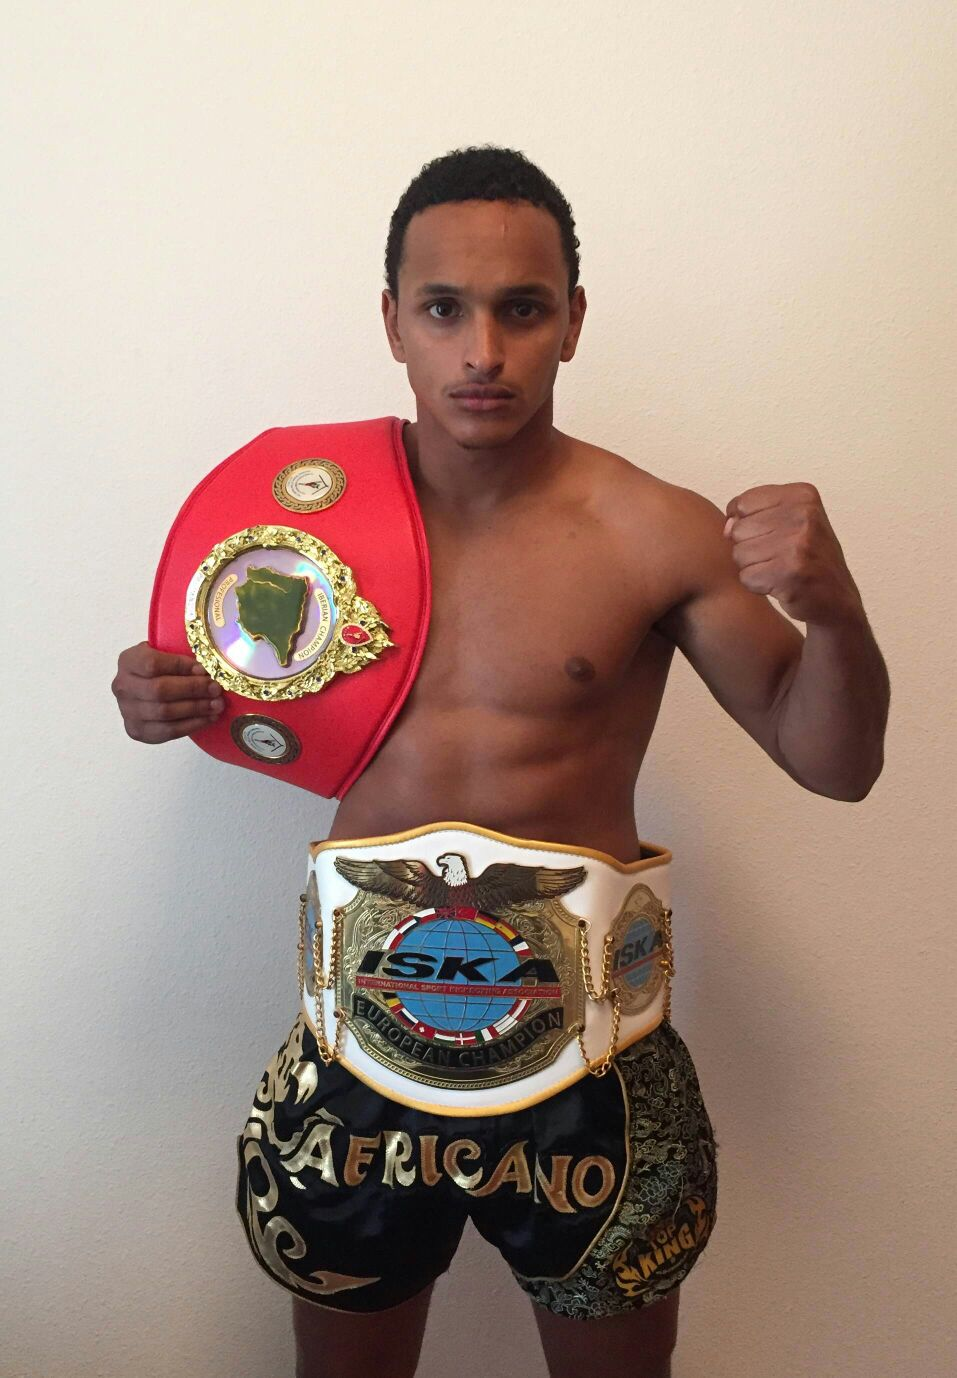 campeón de Europa Iska Luis Africano 2